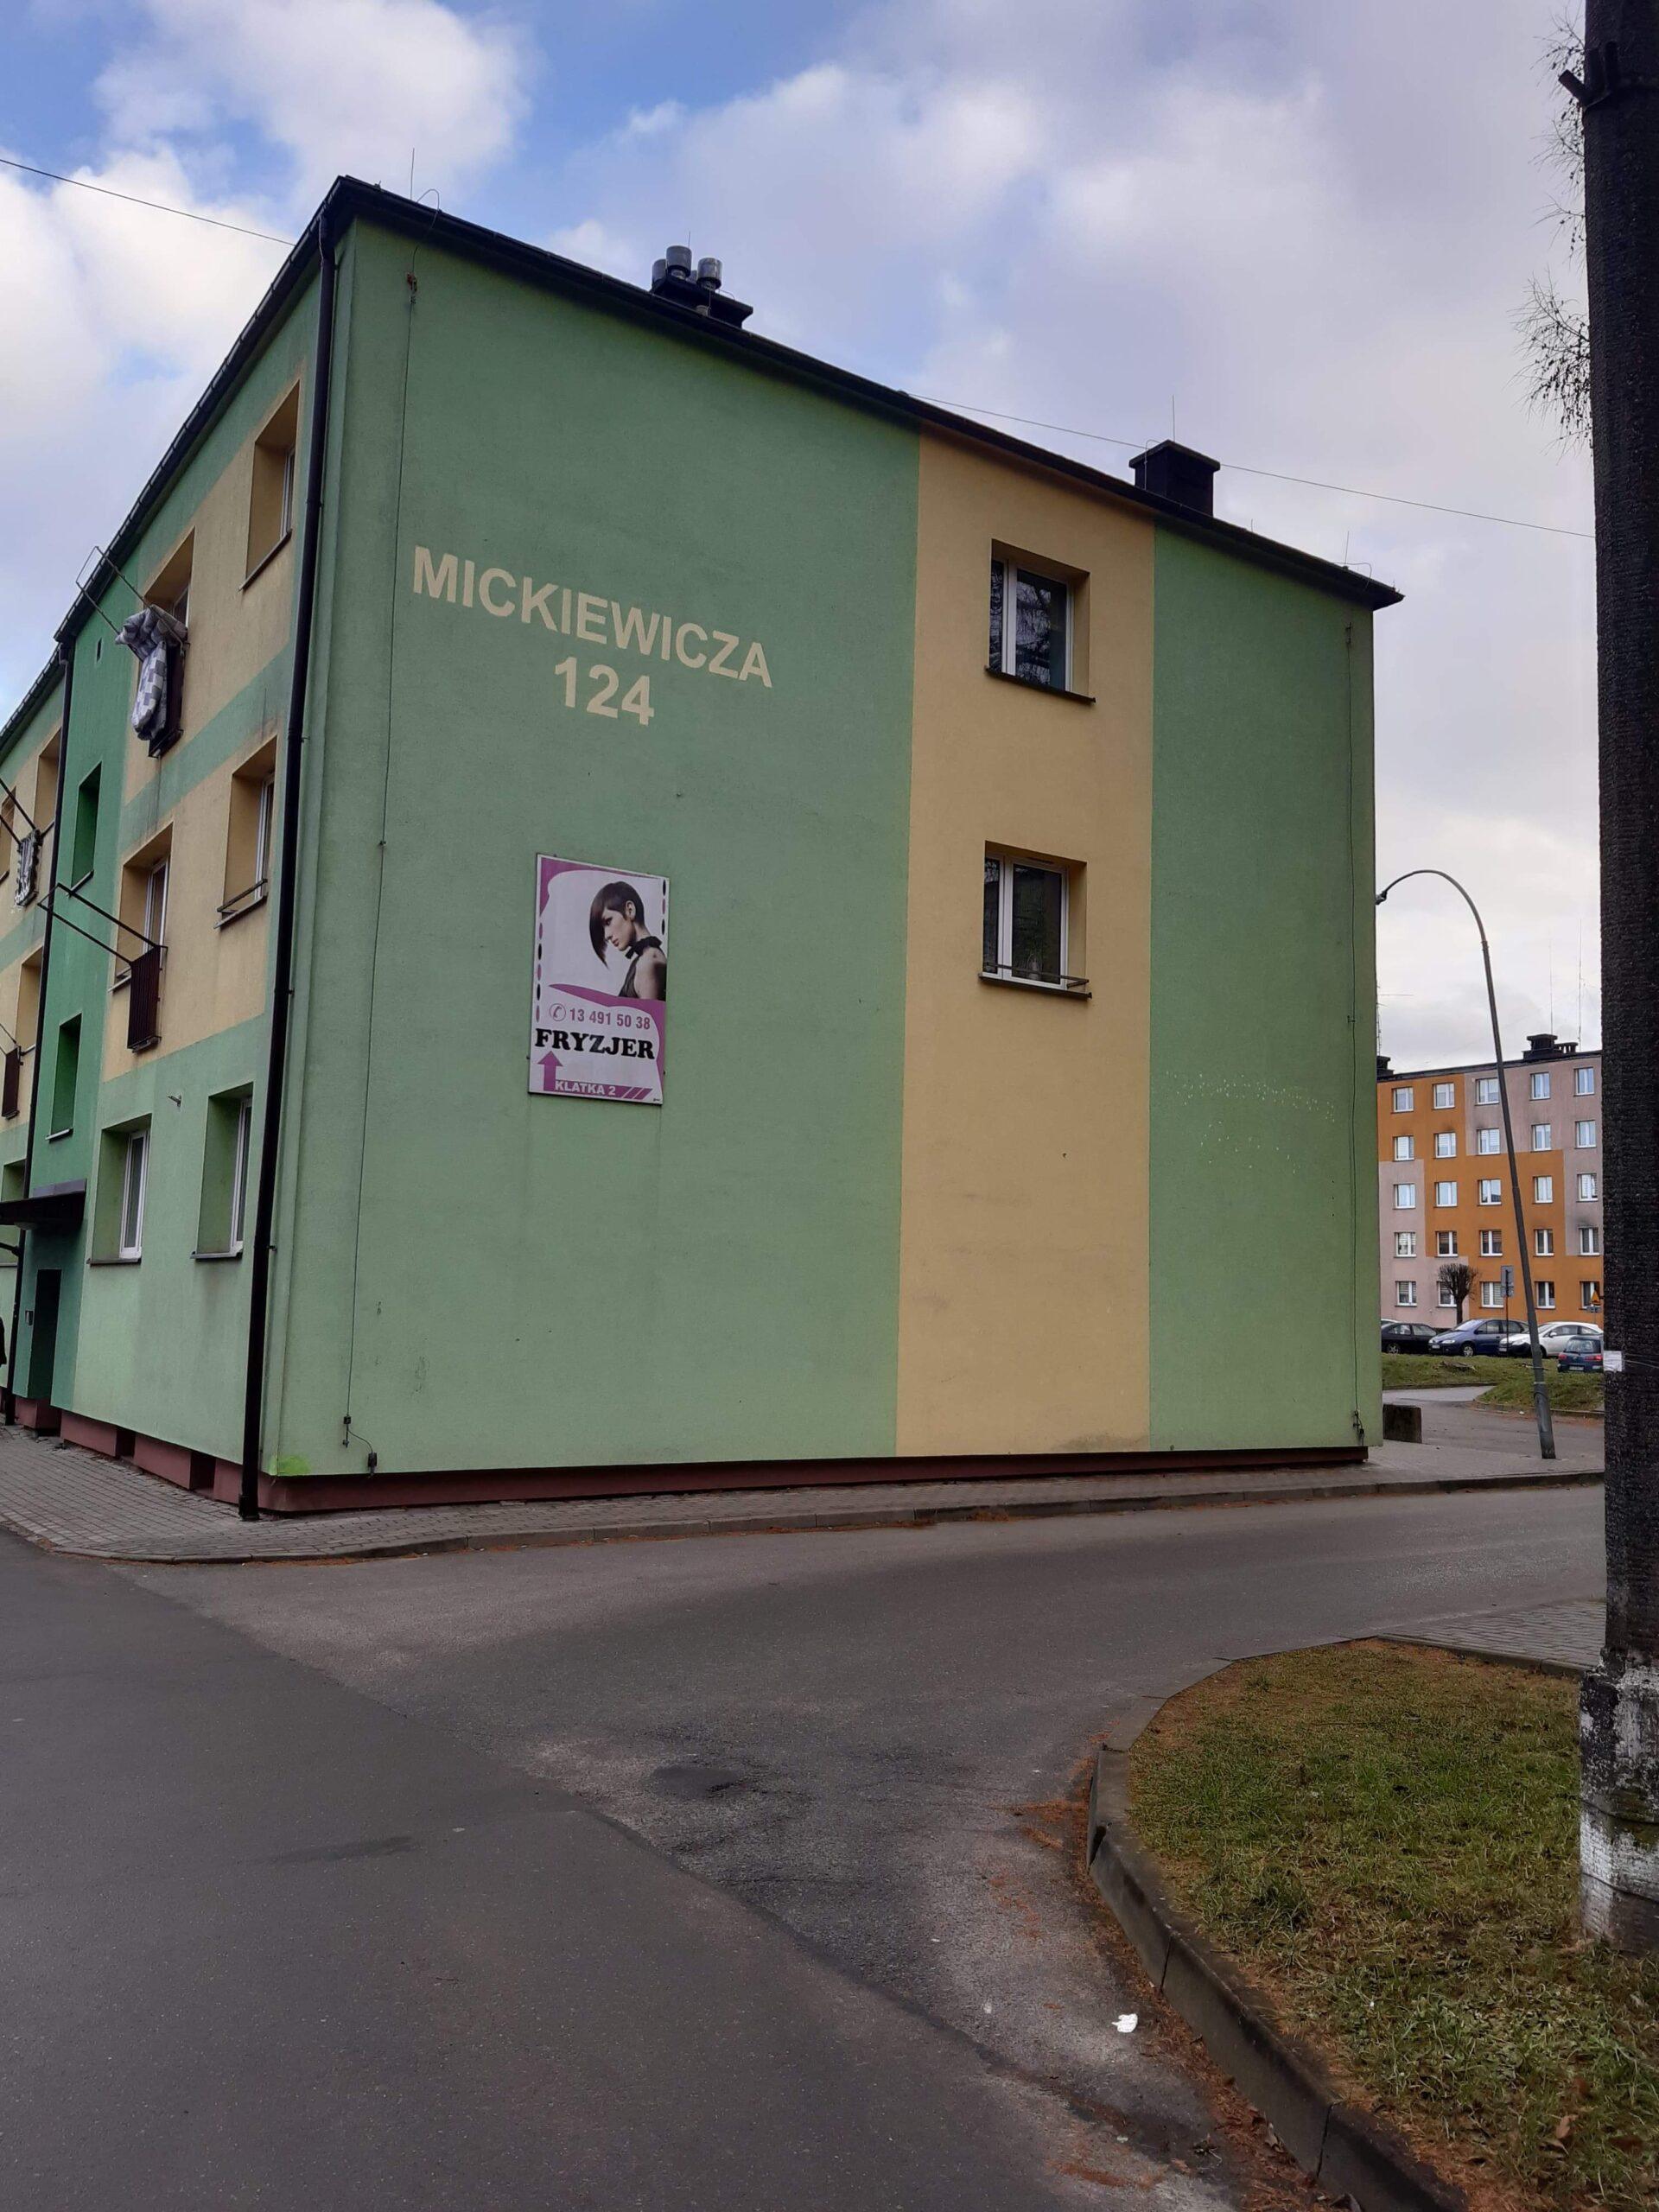 Mickiewicza 124